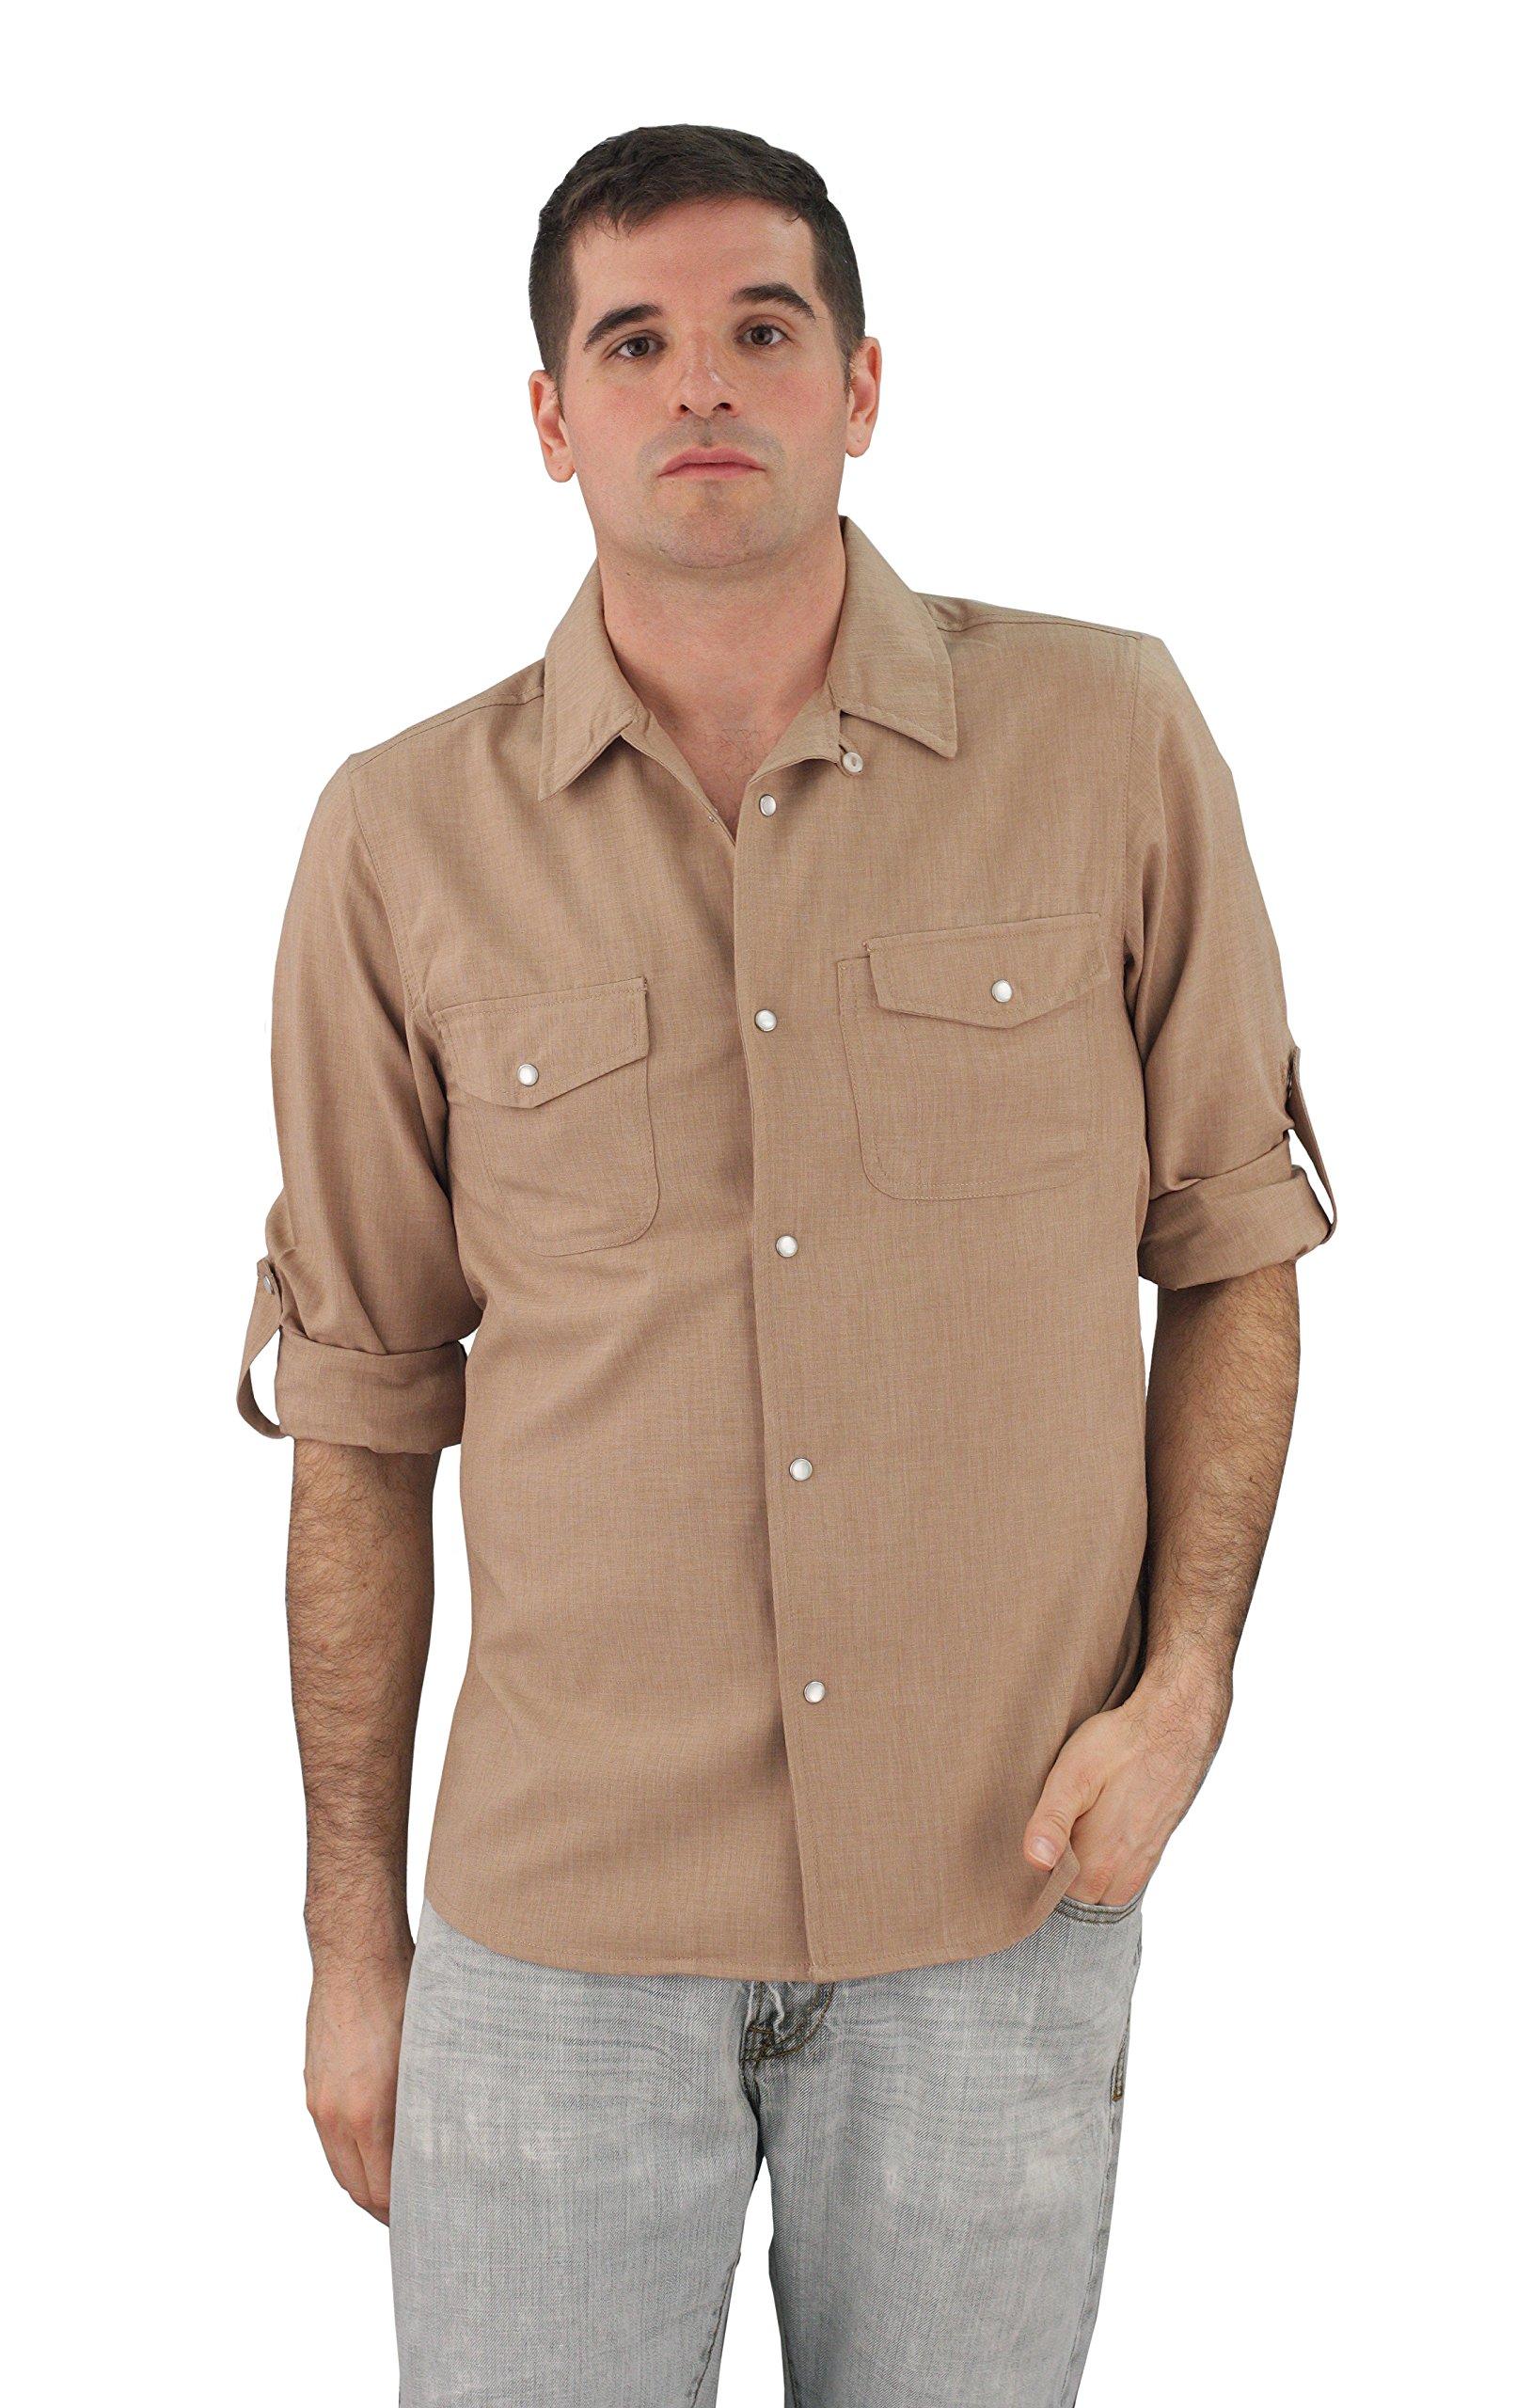 ASD Living Zanzibar Long Sleeve Dry Fit Server Waitstaff Shirt, XX-Large, Almond